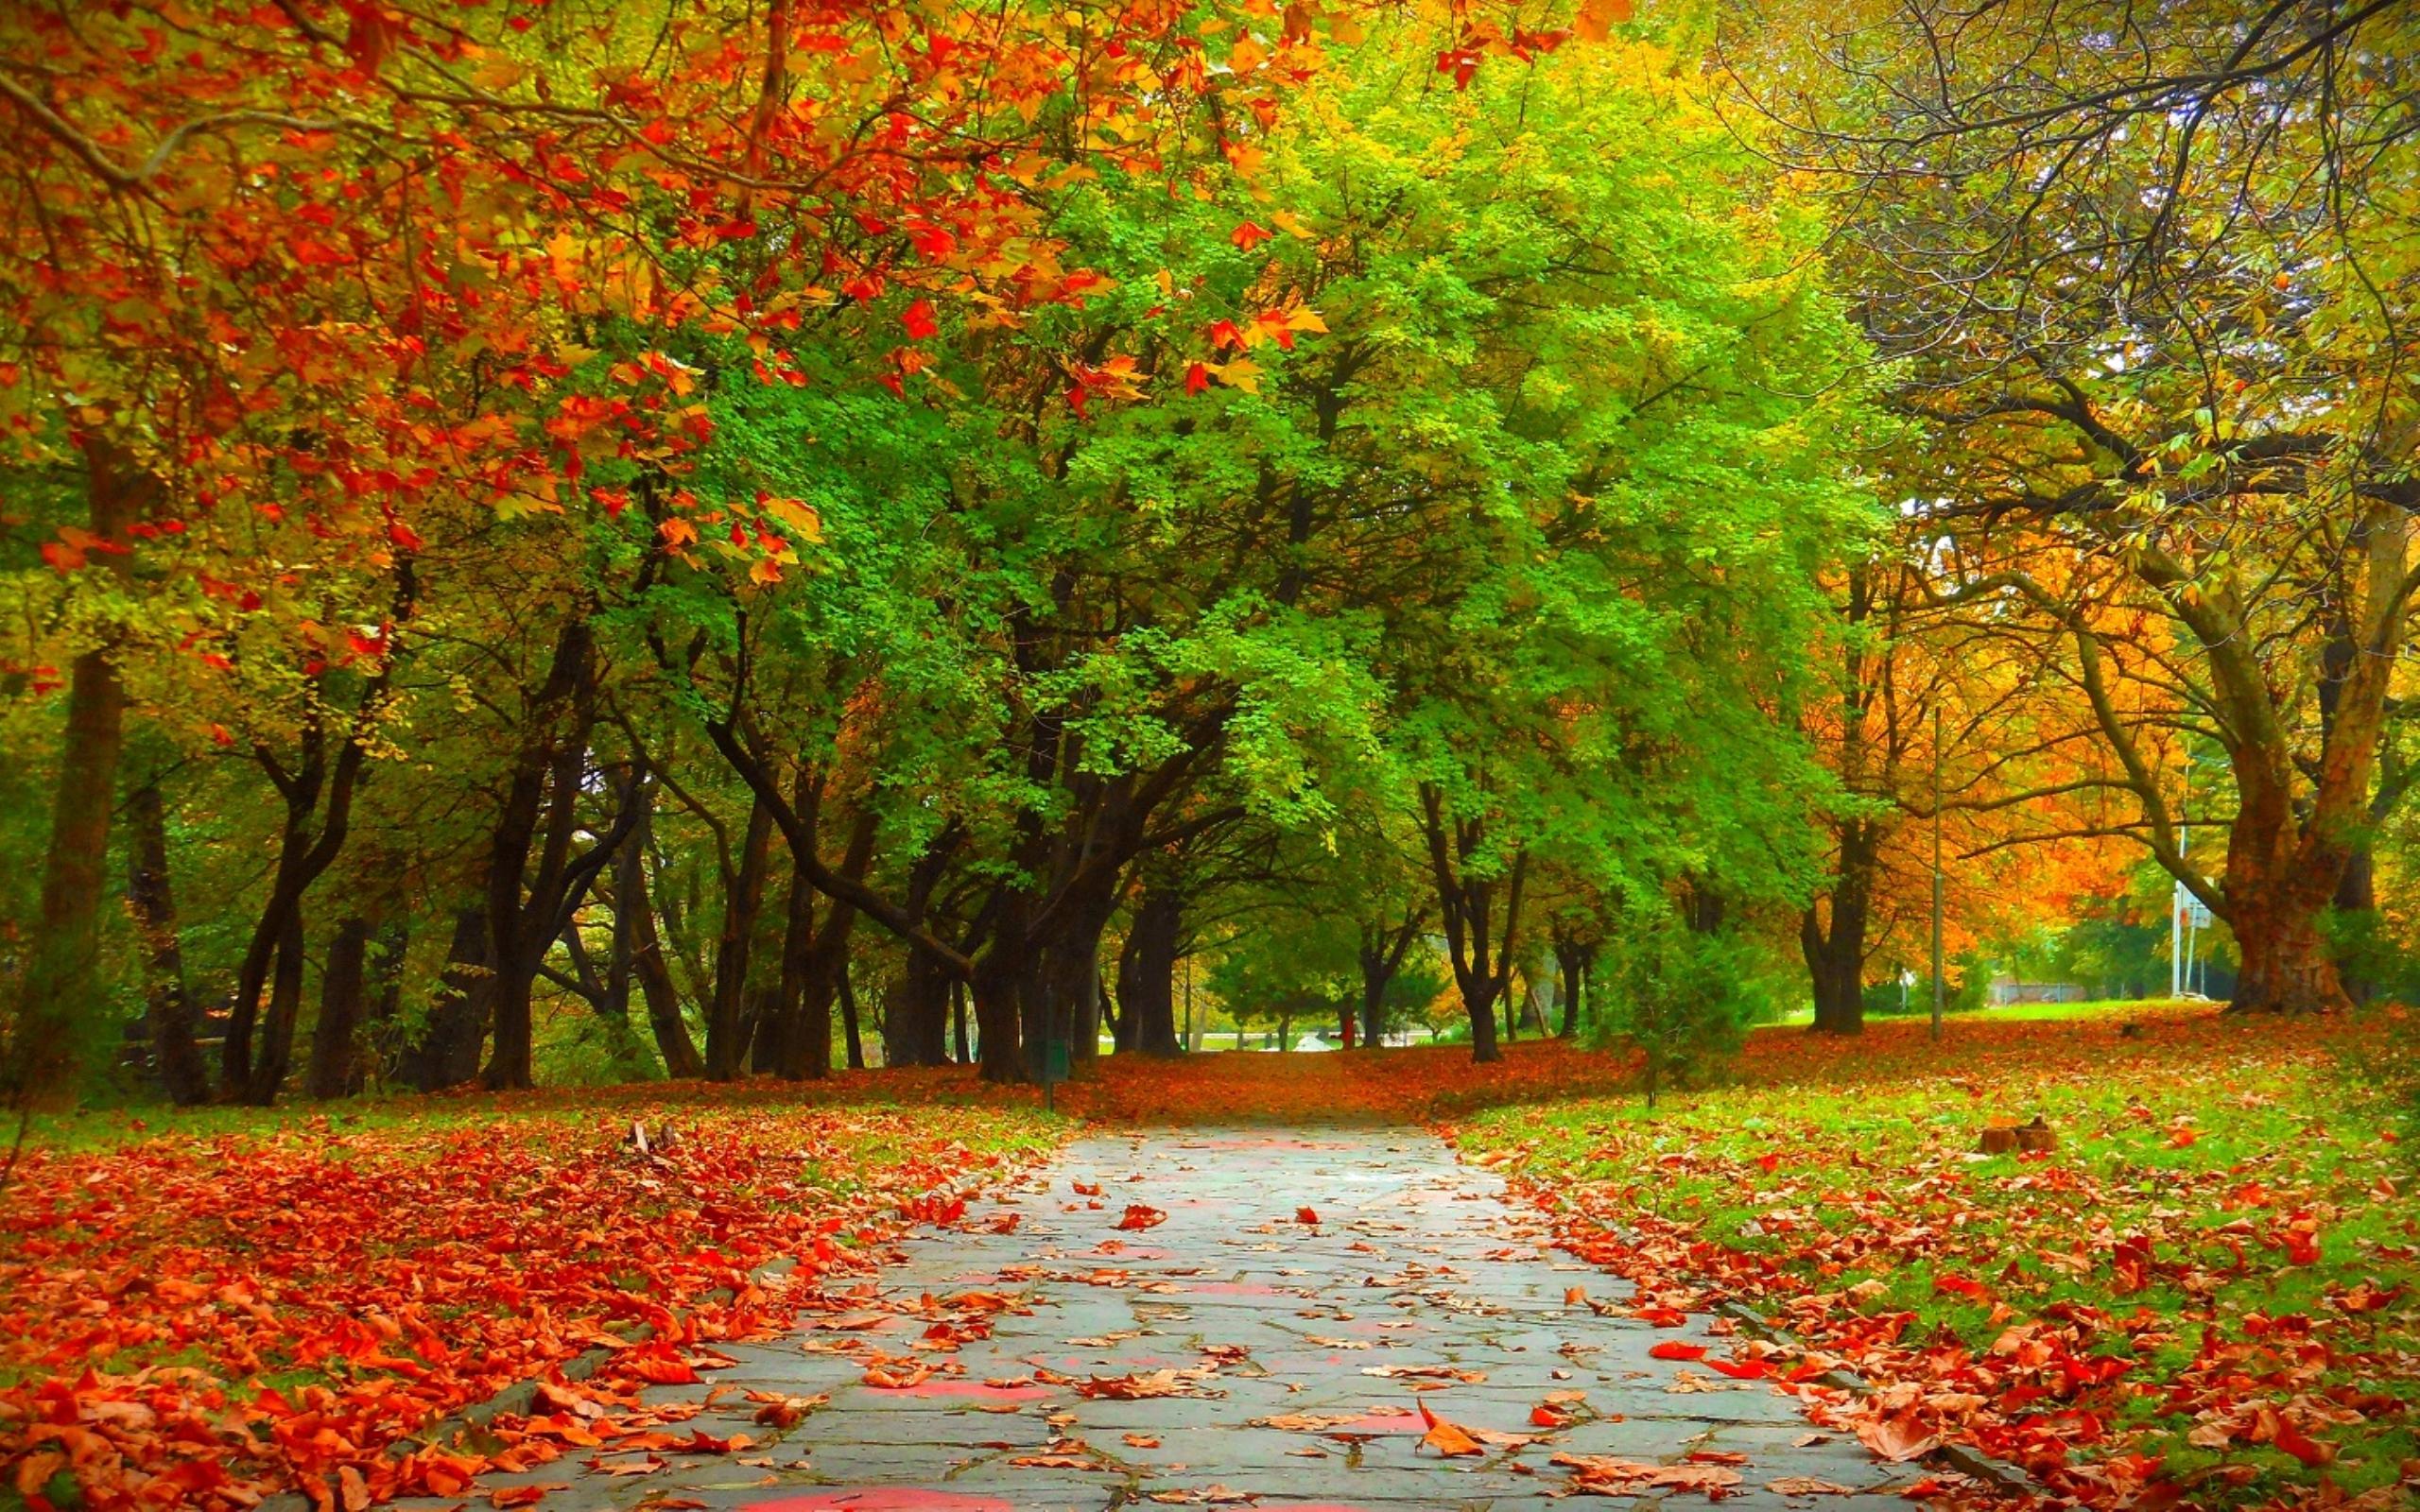 Tree Fall Autumn Nature 2560x1600 2560x1600